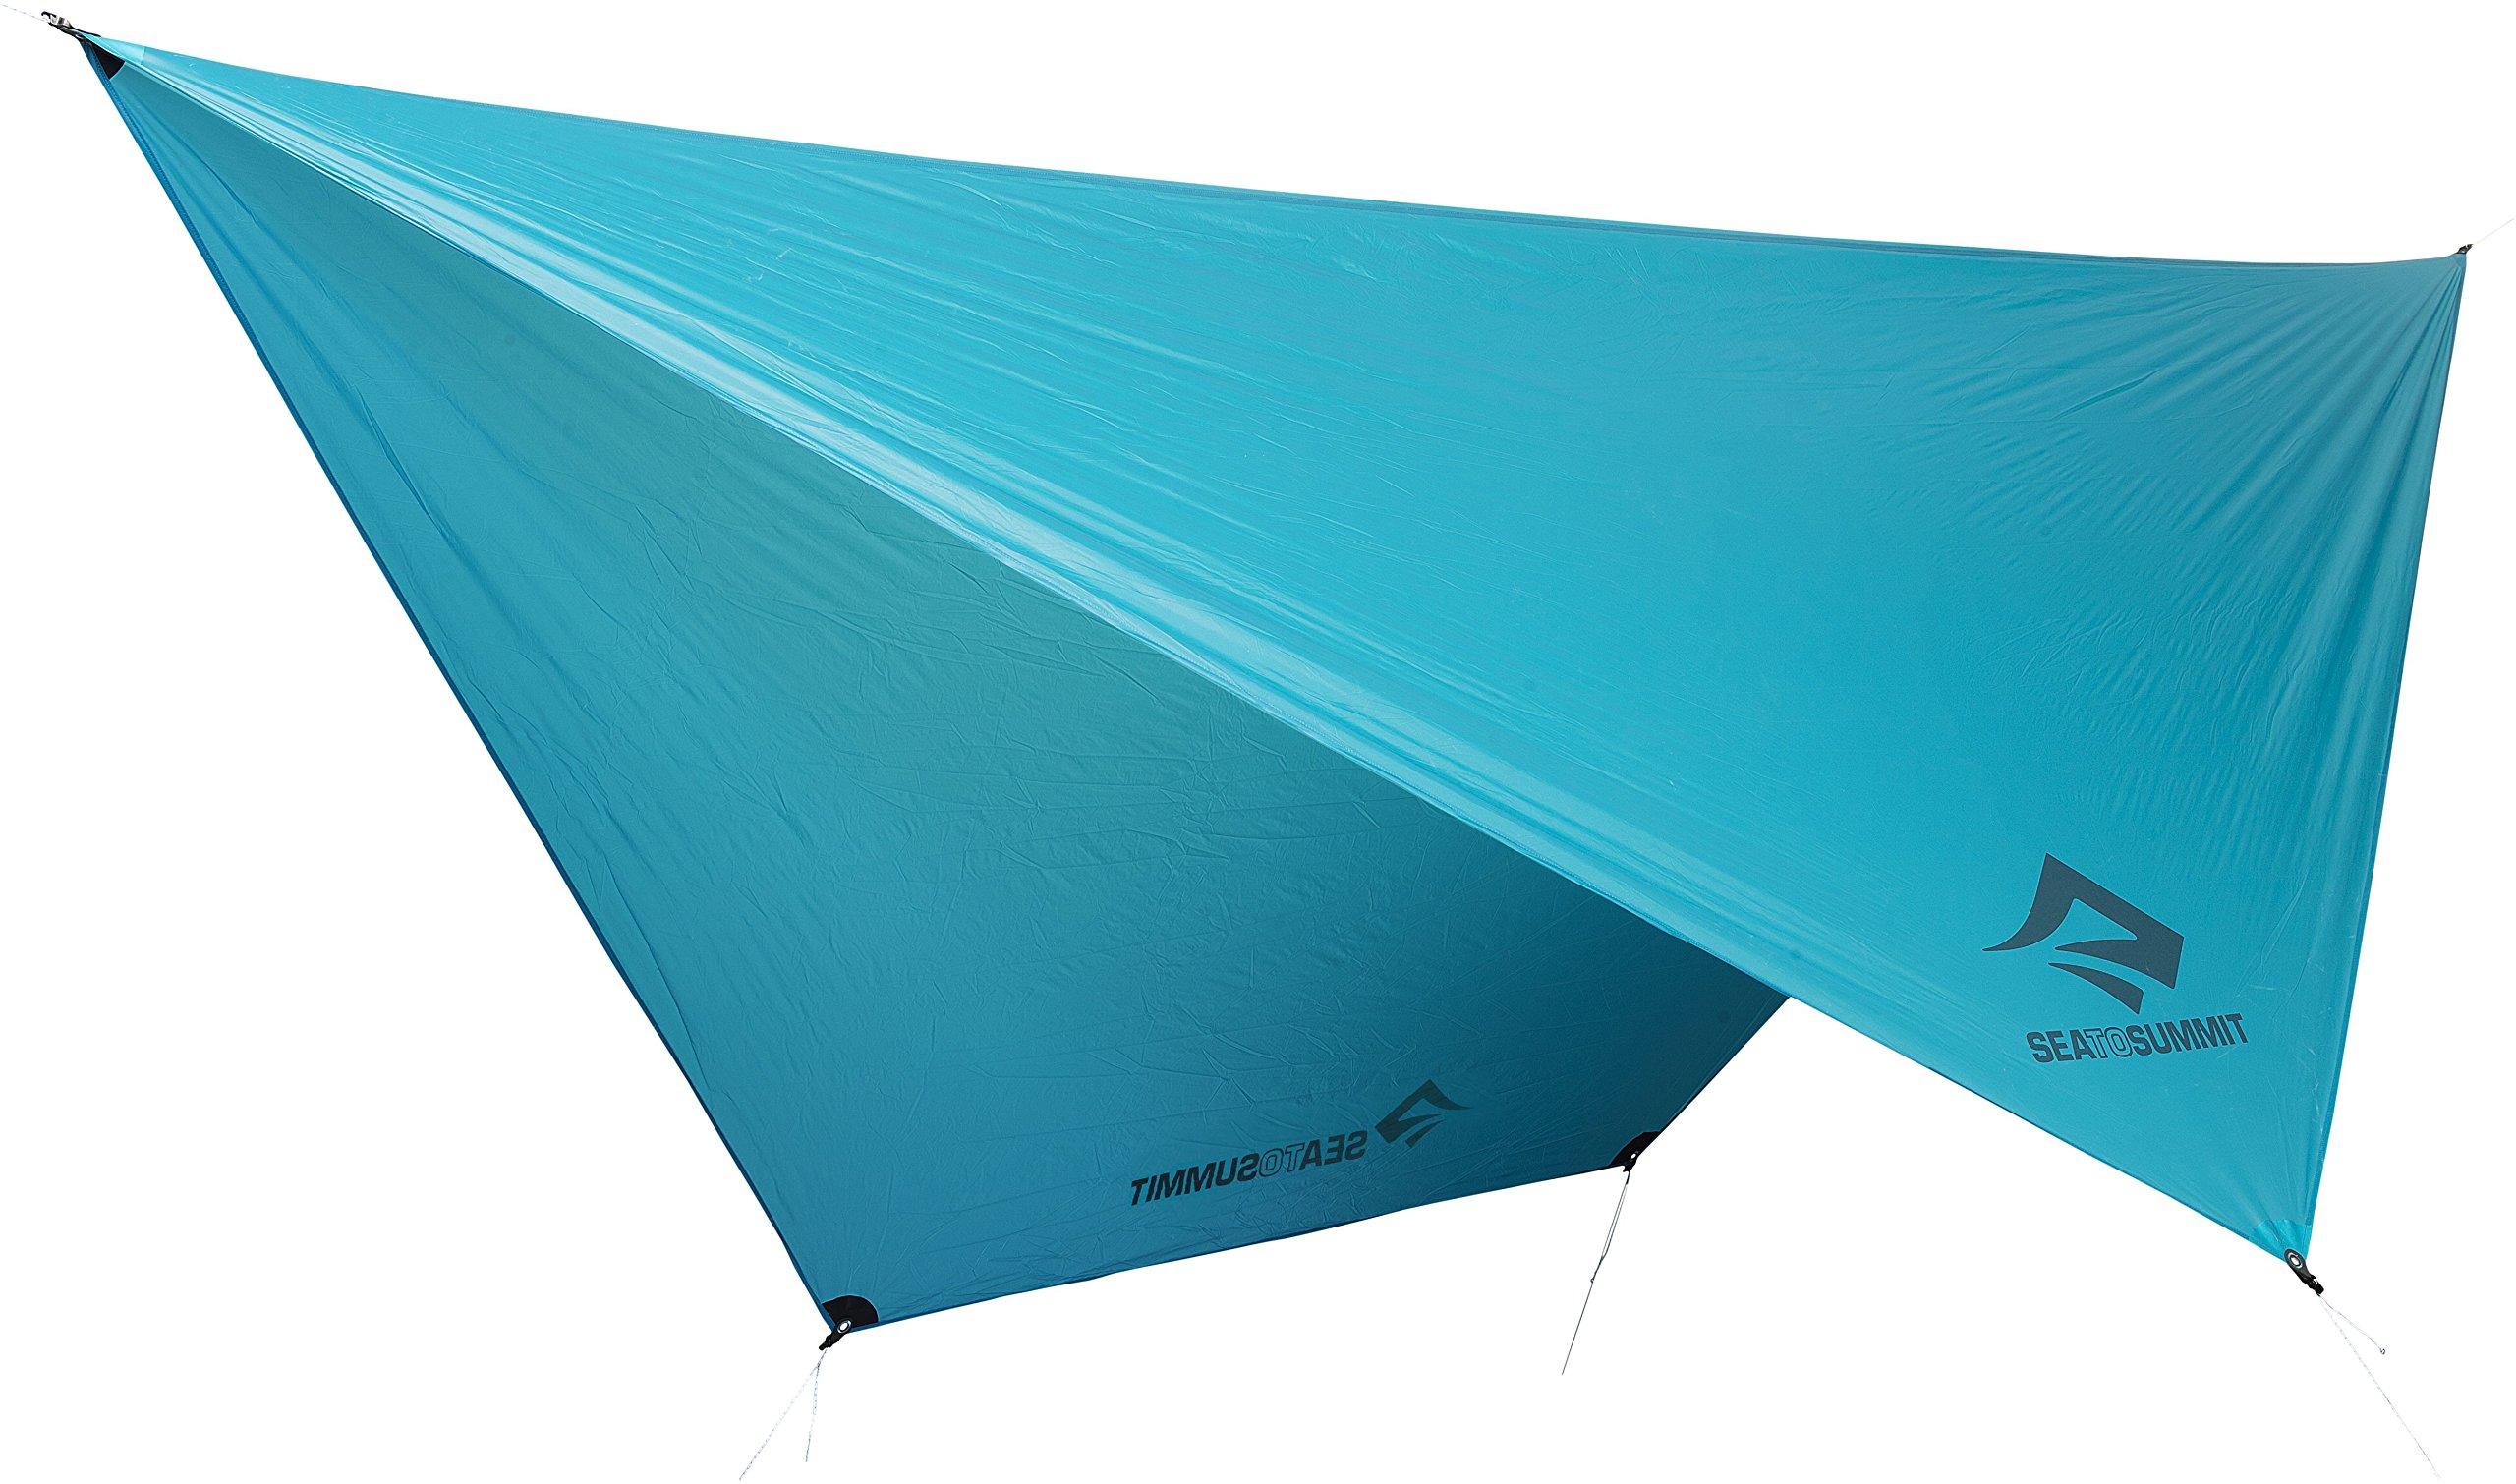 Sea to Summit Waterproof Lightweight & Durable Camping Tarp Hammock